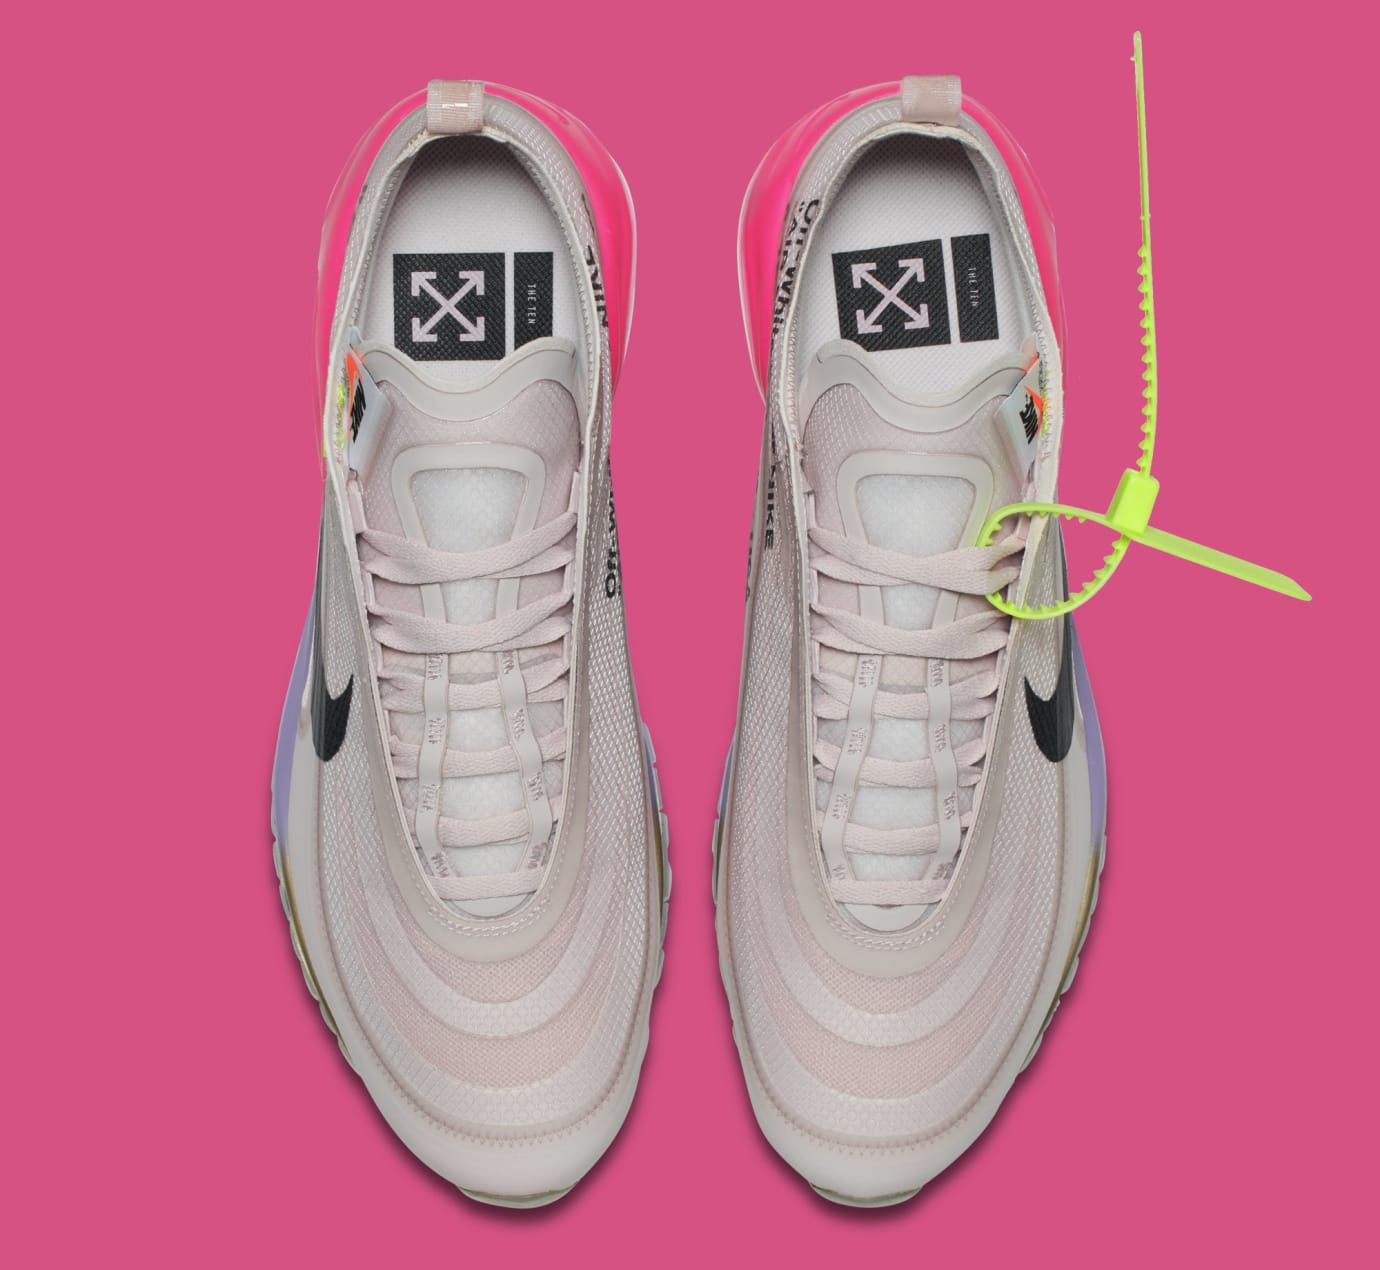 Image via Nike Off-White x Nike Air Max 97 Serena Williams  Queen   AJ4585-600 825c6b37b